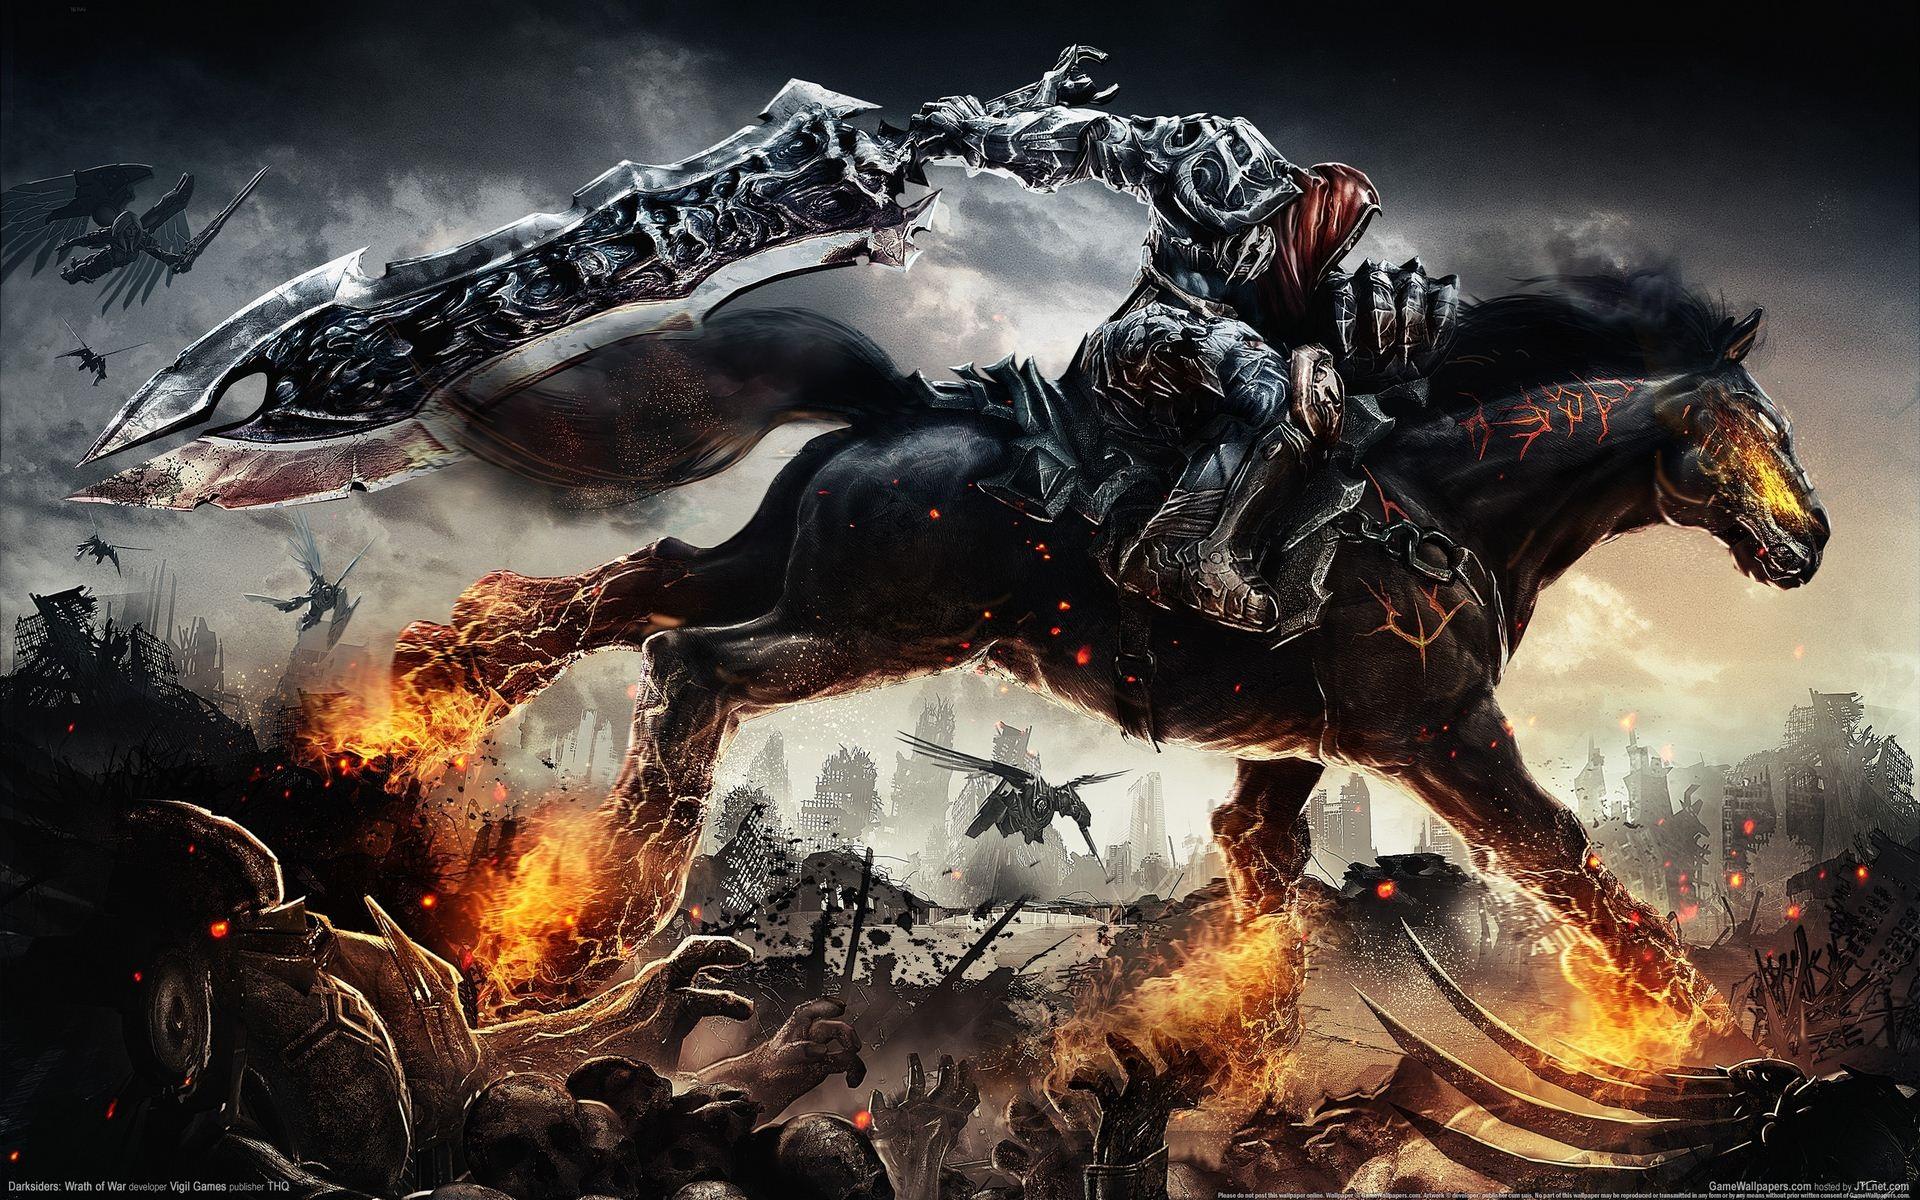 Popular   Wallpaper Horse Nightmare - latest?cb\u003d20111203072512  You Should Have_76755.jpg/revision/latest?cb\u003d20111203072512